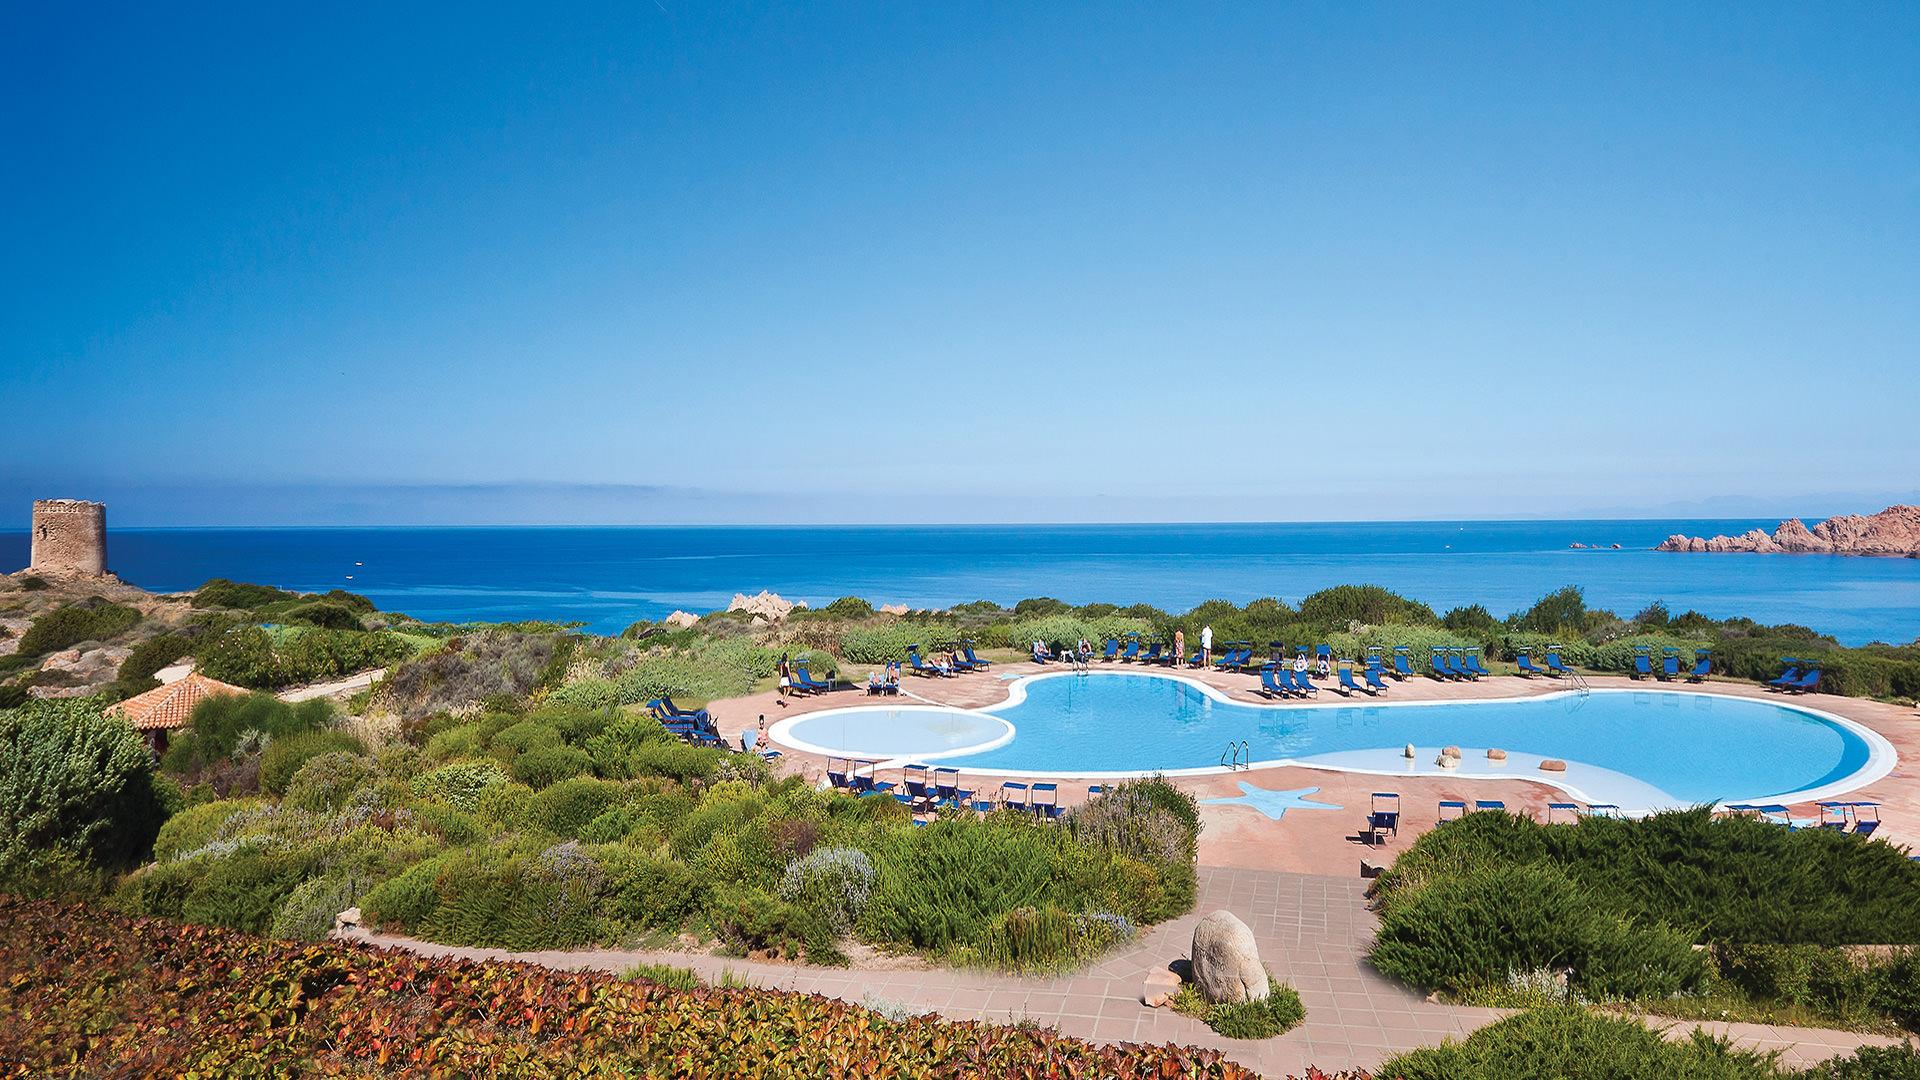 hotel-torreruja-slider-piscina-mare-isola-rossa_mini